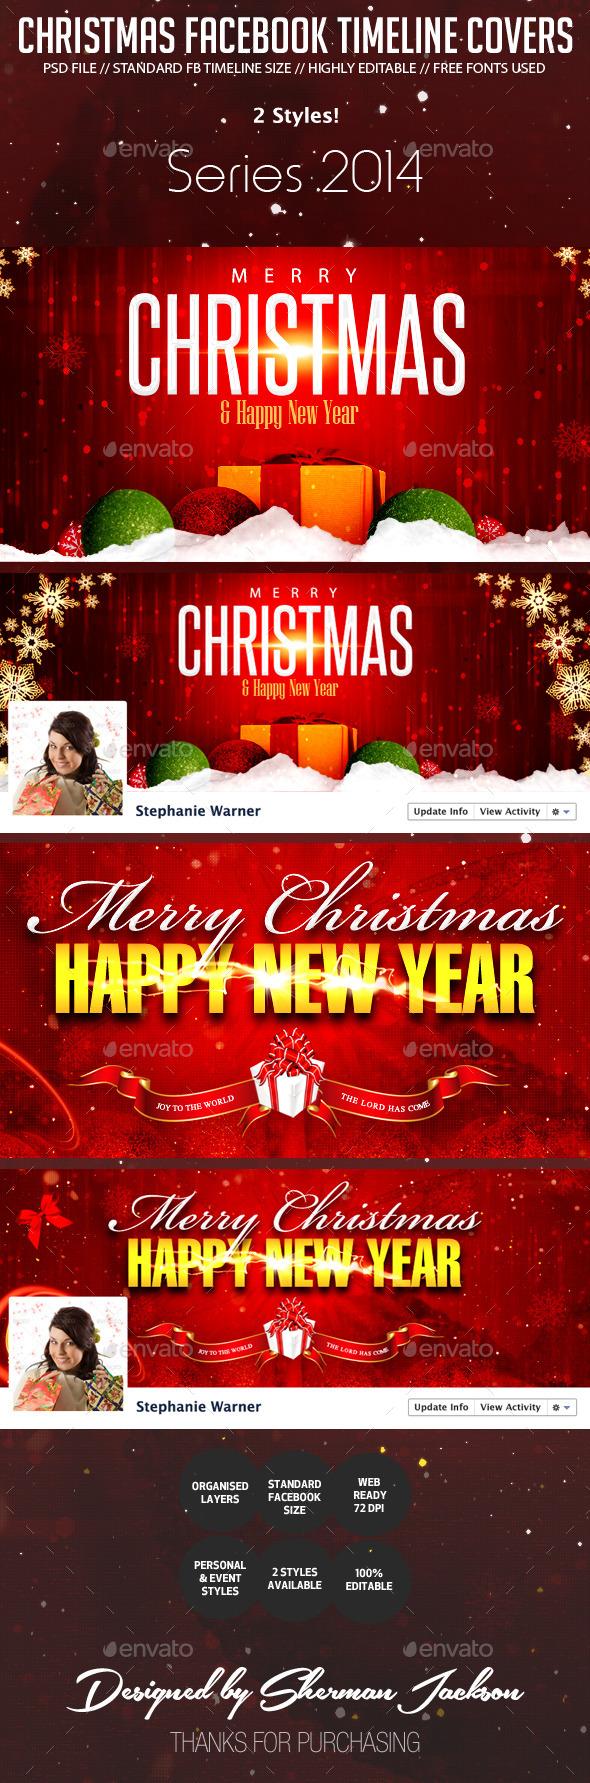 Christmas Holiday Facebook Cover Photos - Facebook Timeline Covers Social Media